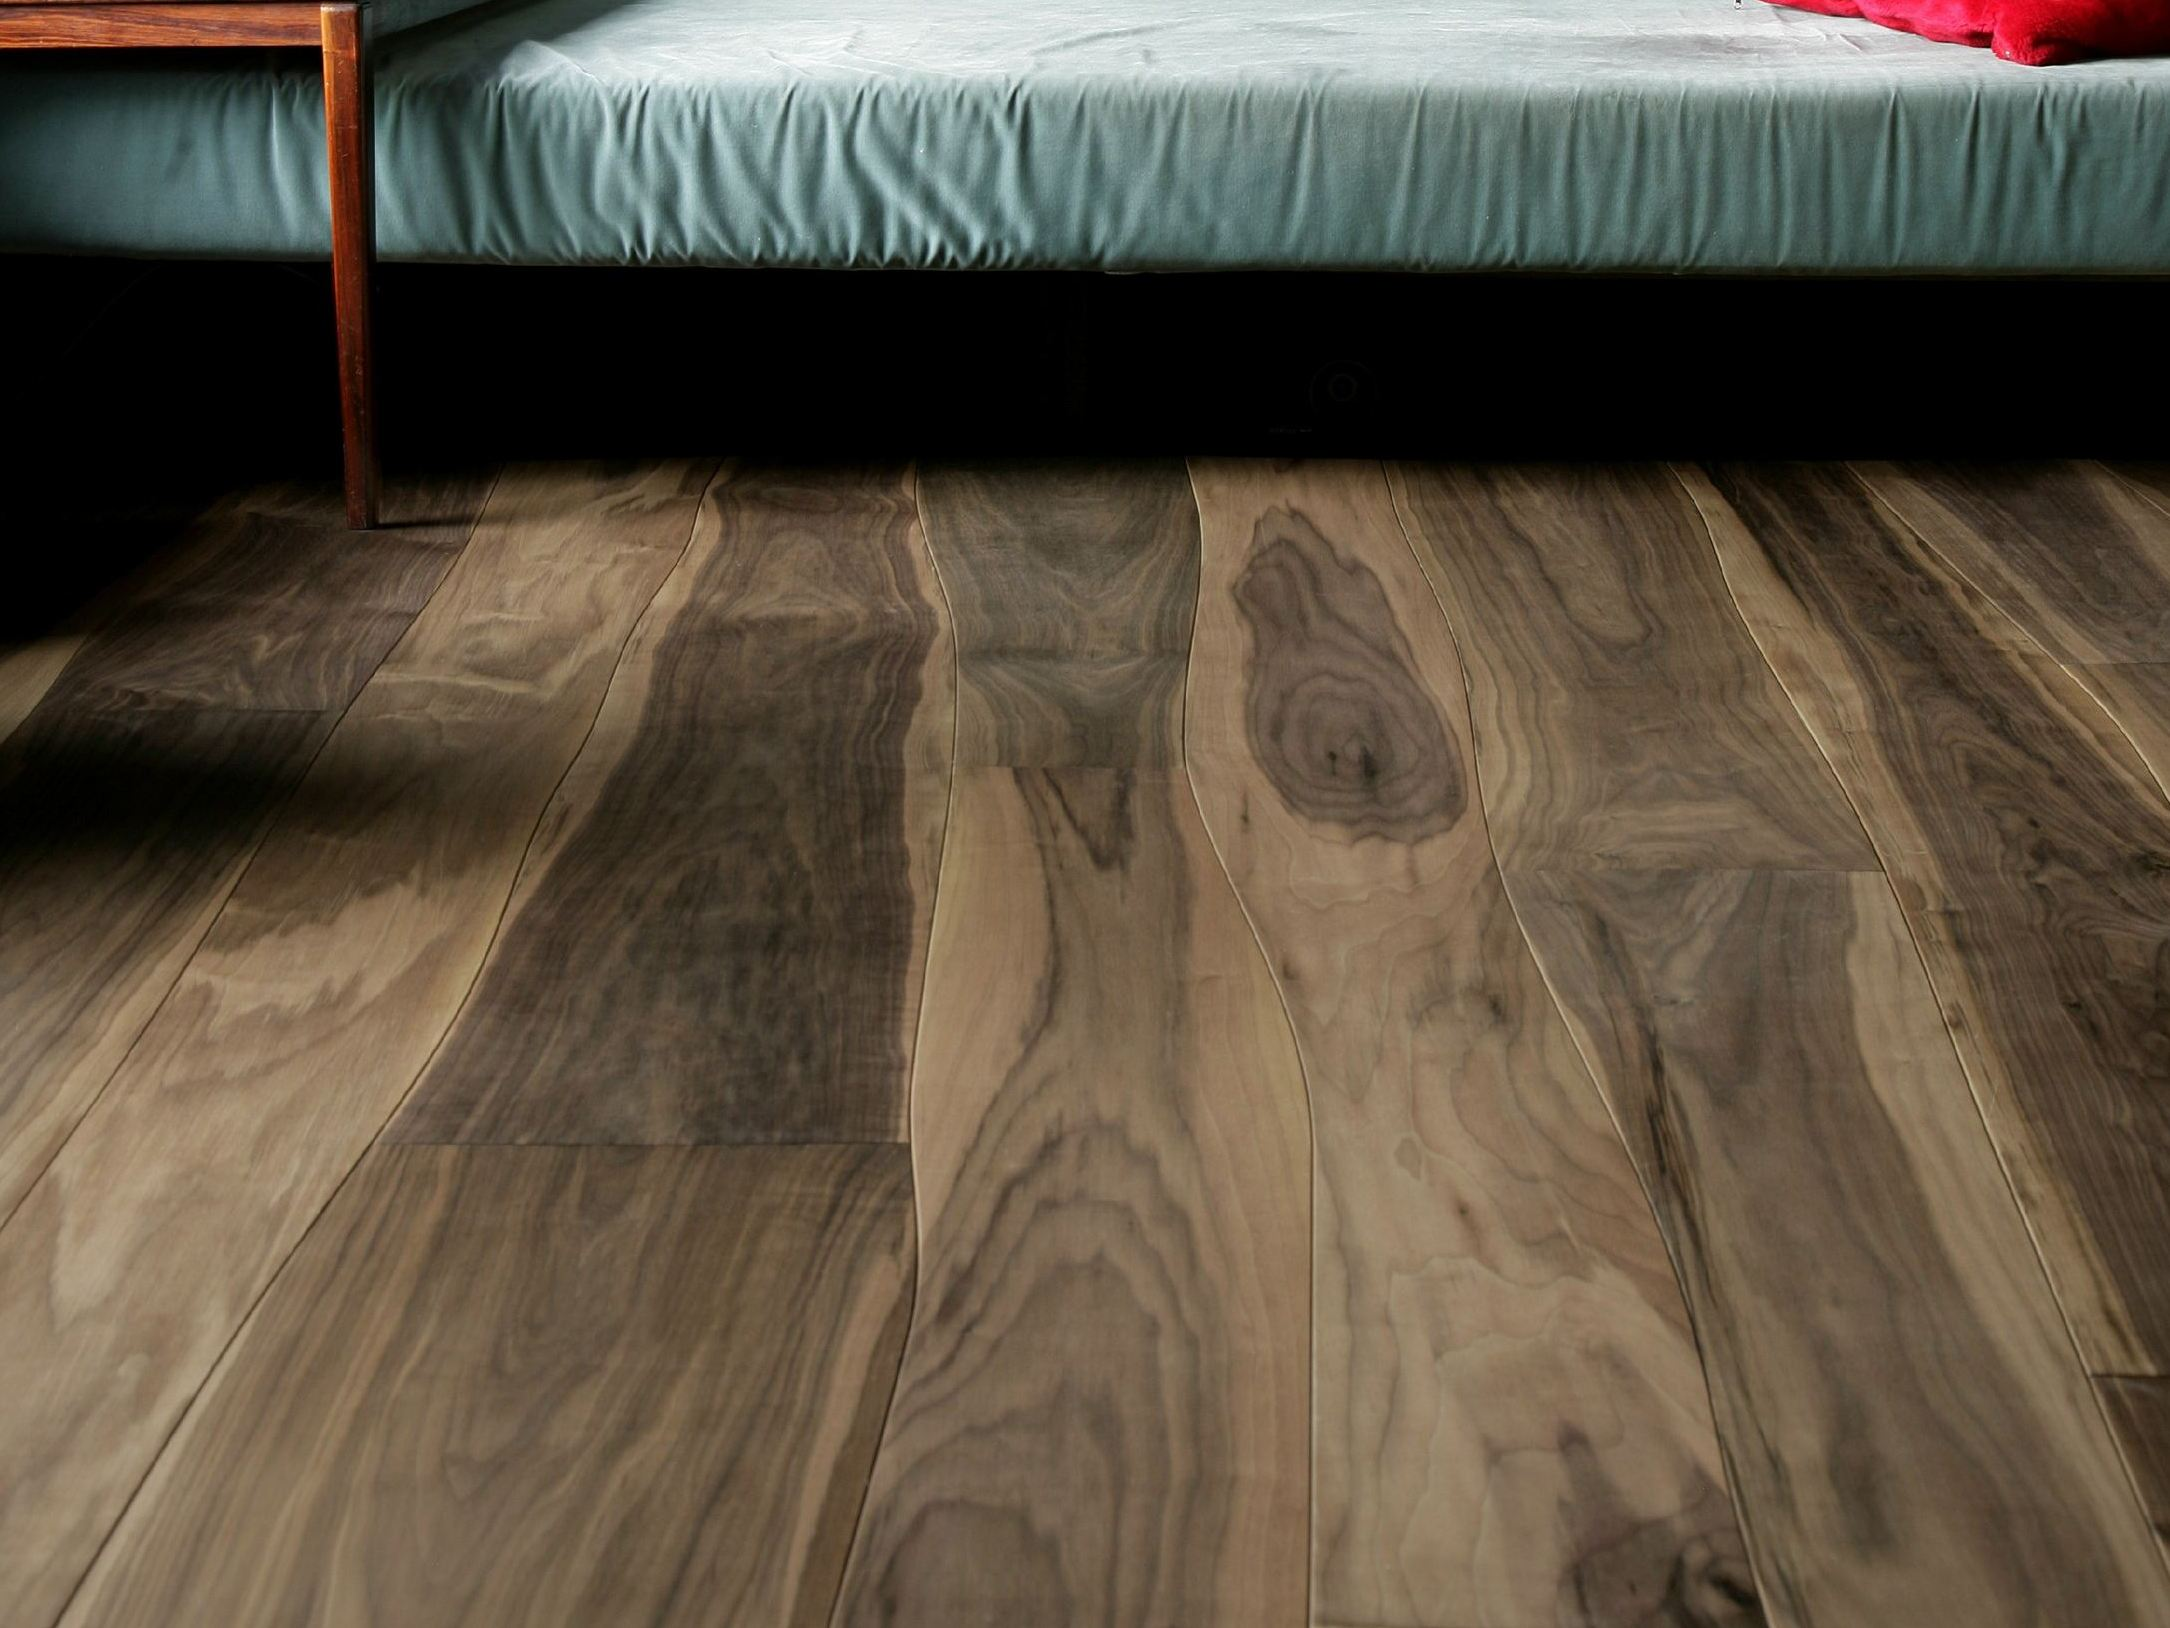 rev tement de sol en noyer by bolefloor. Black Bedroom Furniture Sets. Home Design Ideas